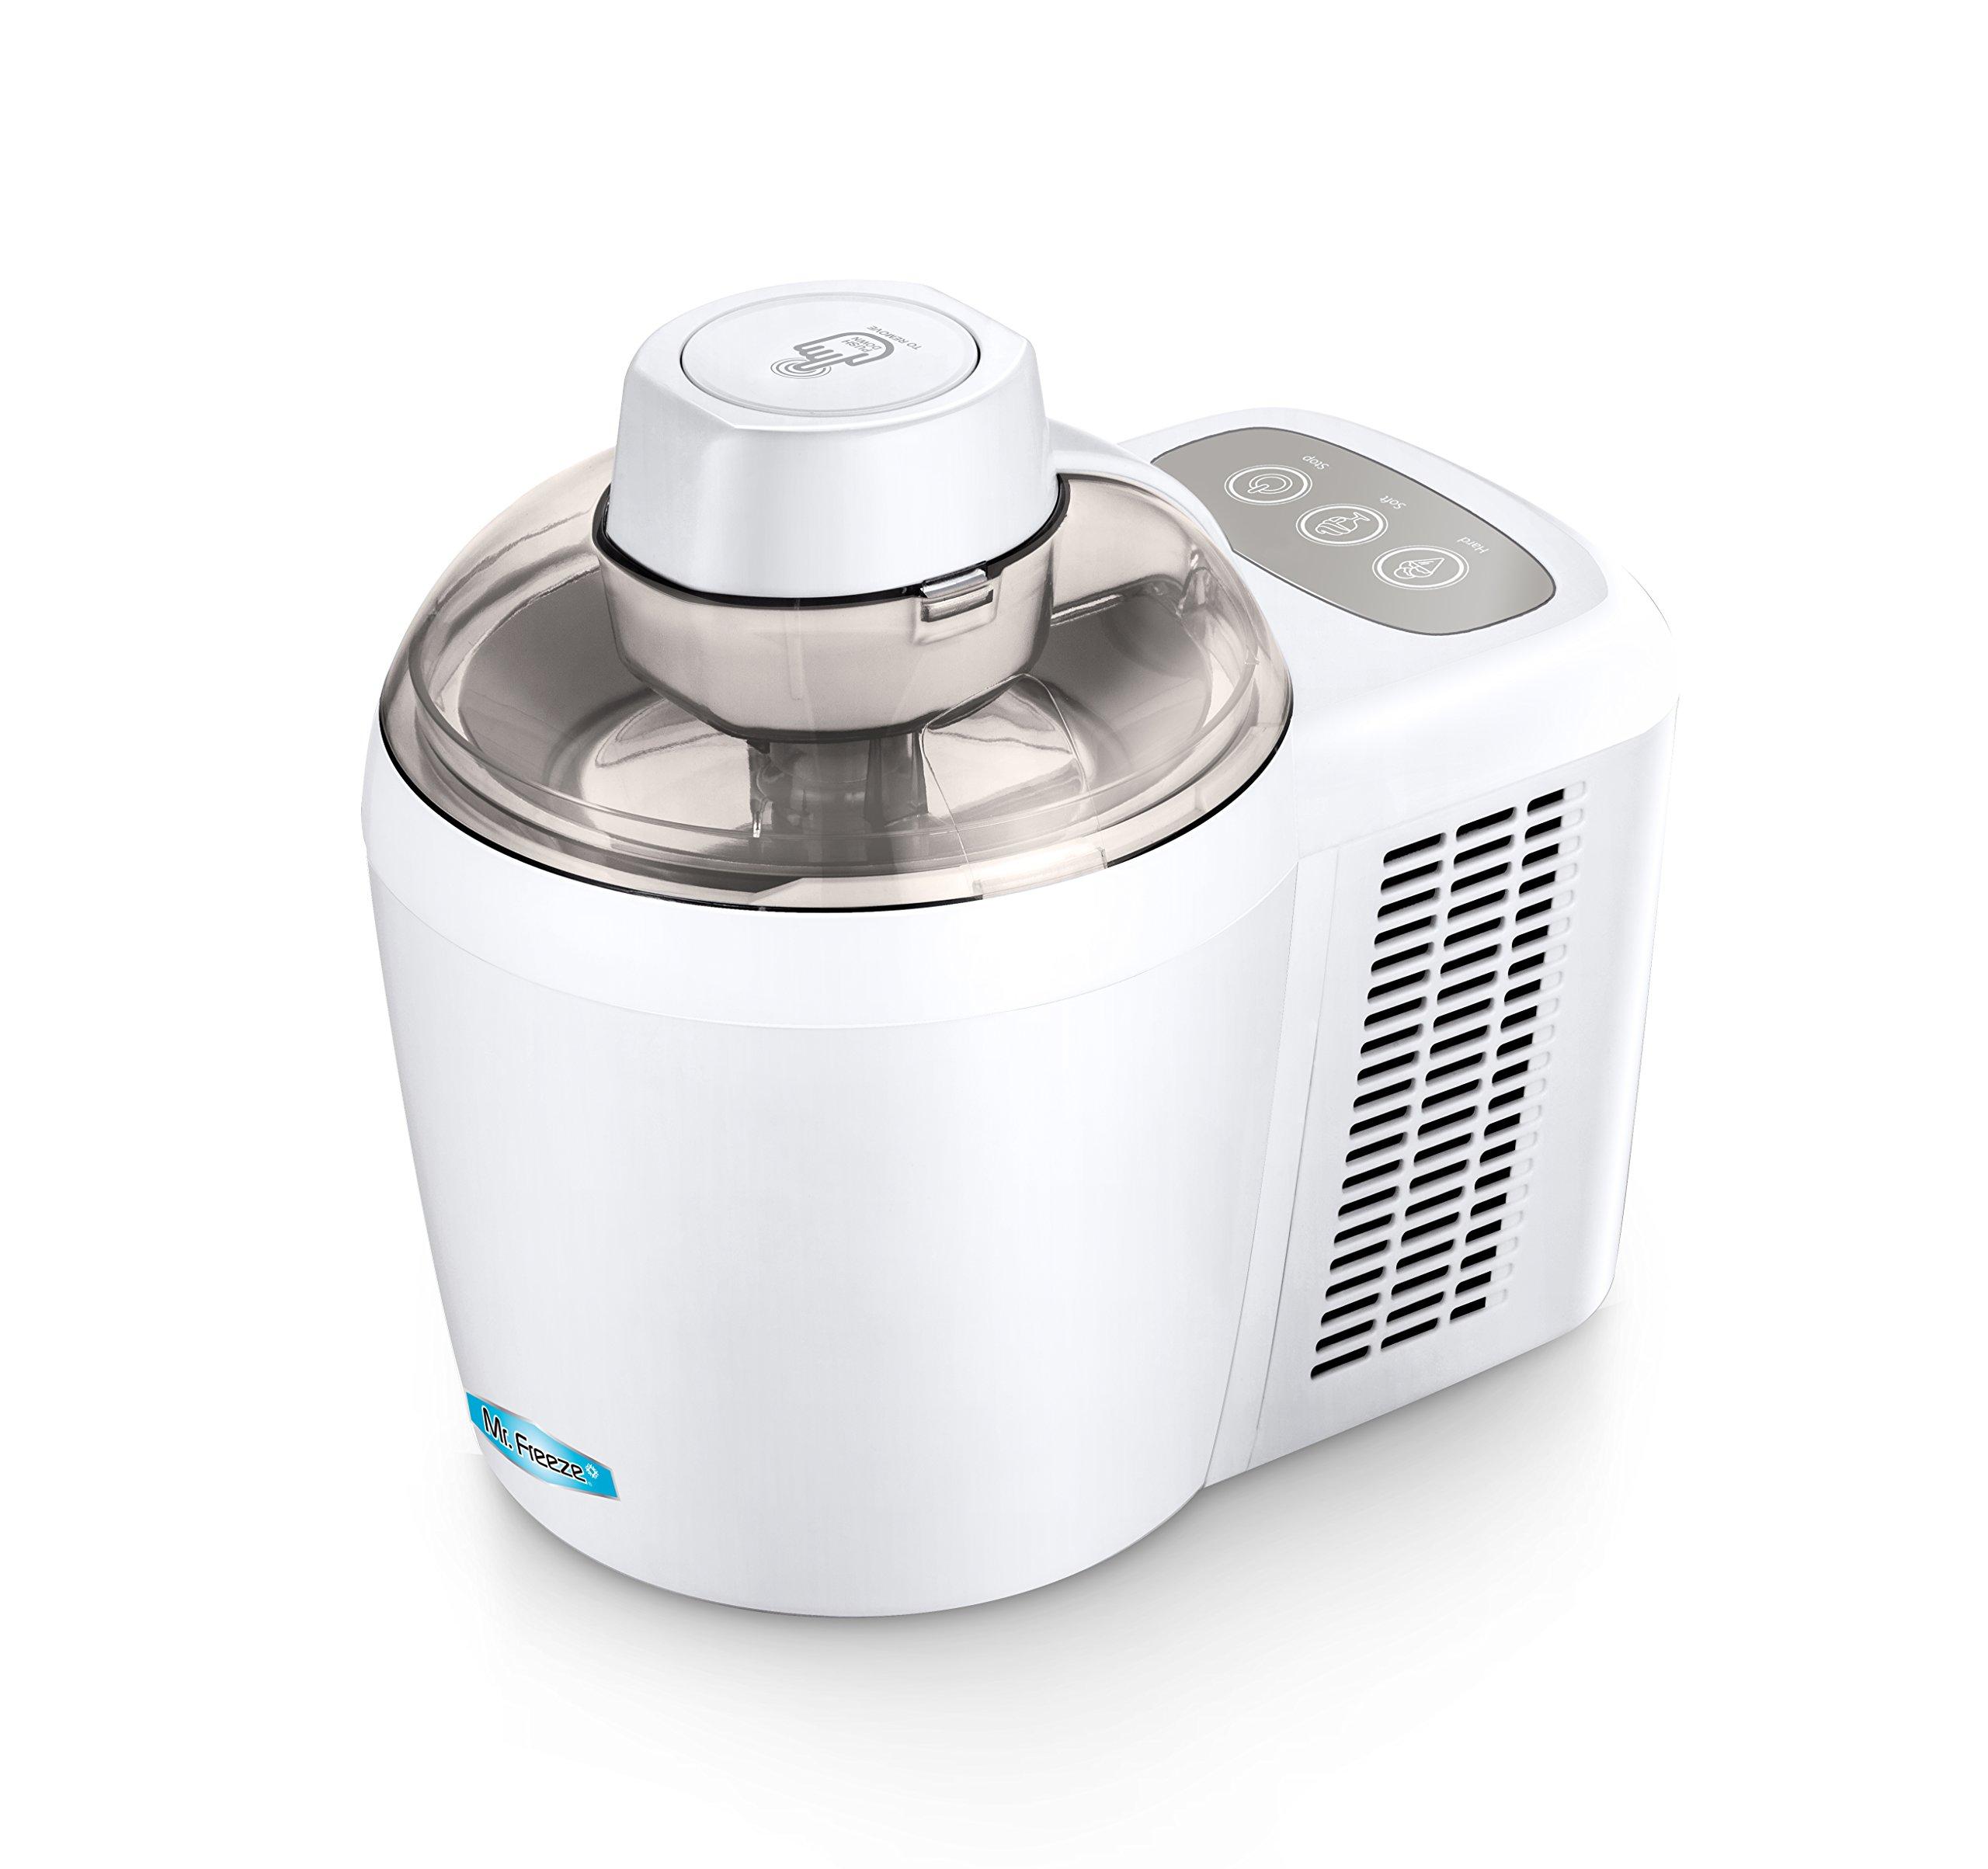 Mr. Freeze EIM-700 Self-Freezing Self-Refrigerating Ice Cream Maker, 1.5 Pint, White by Maxi-Matic (Image #1)